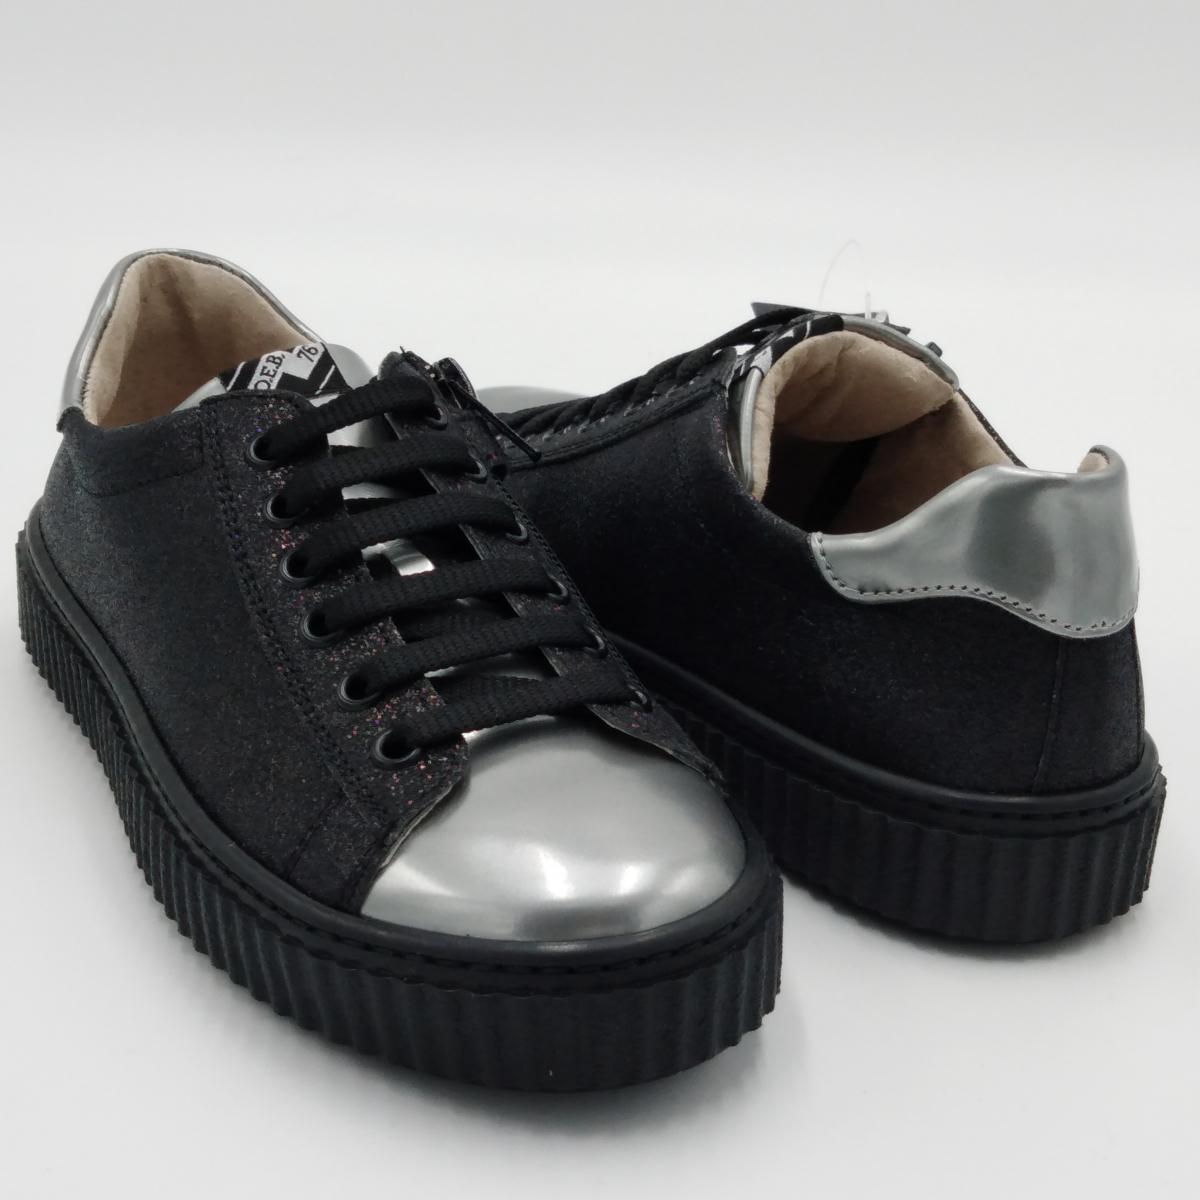 SHO.E.B. 76 -Sneaker lacci...